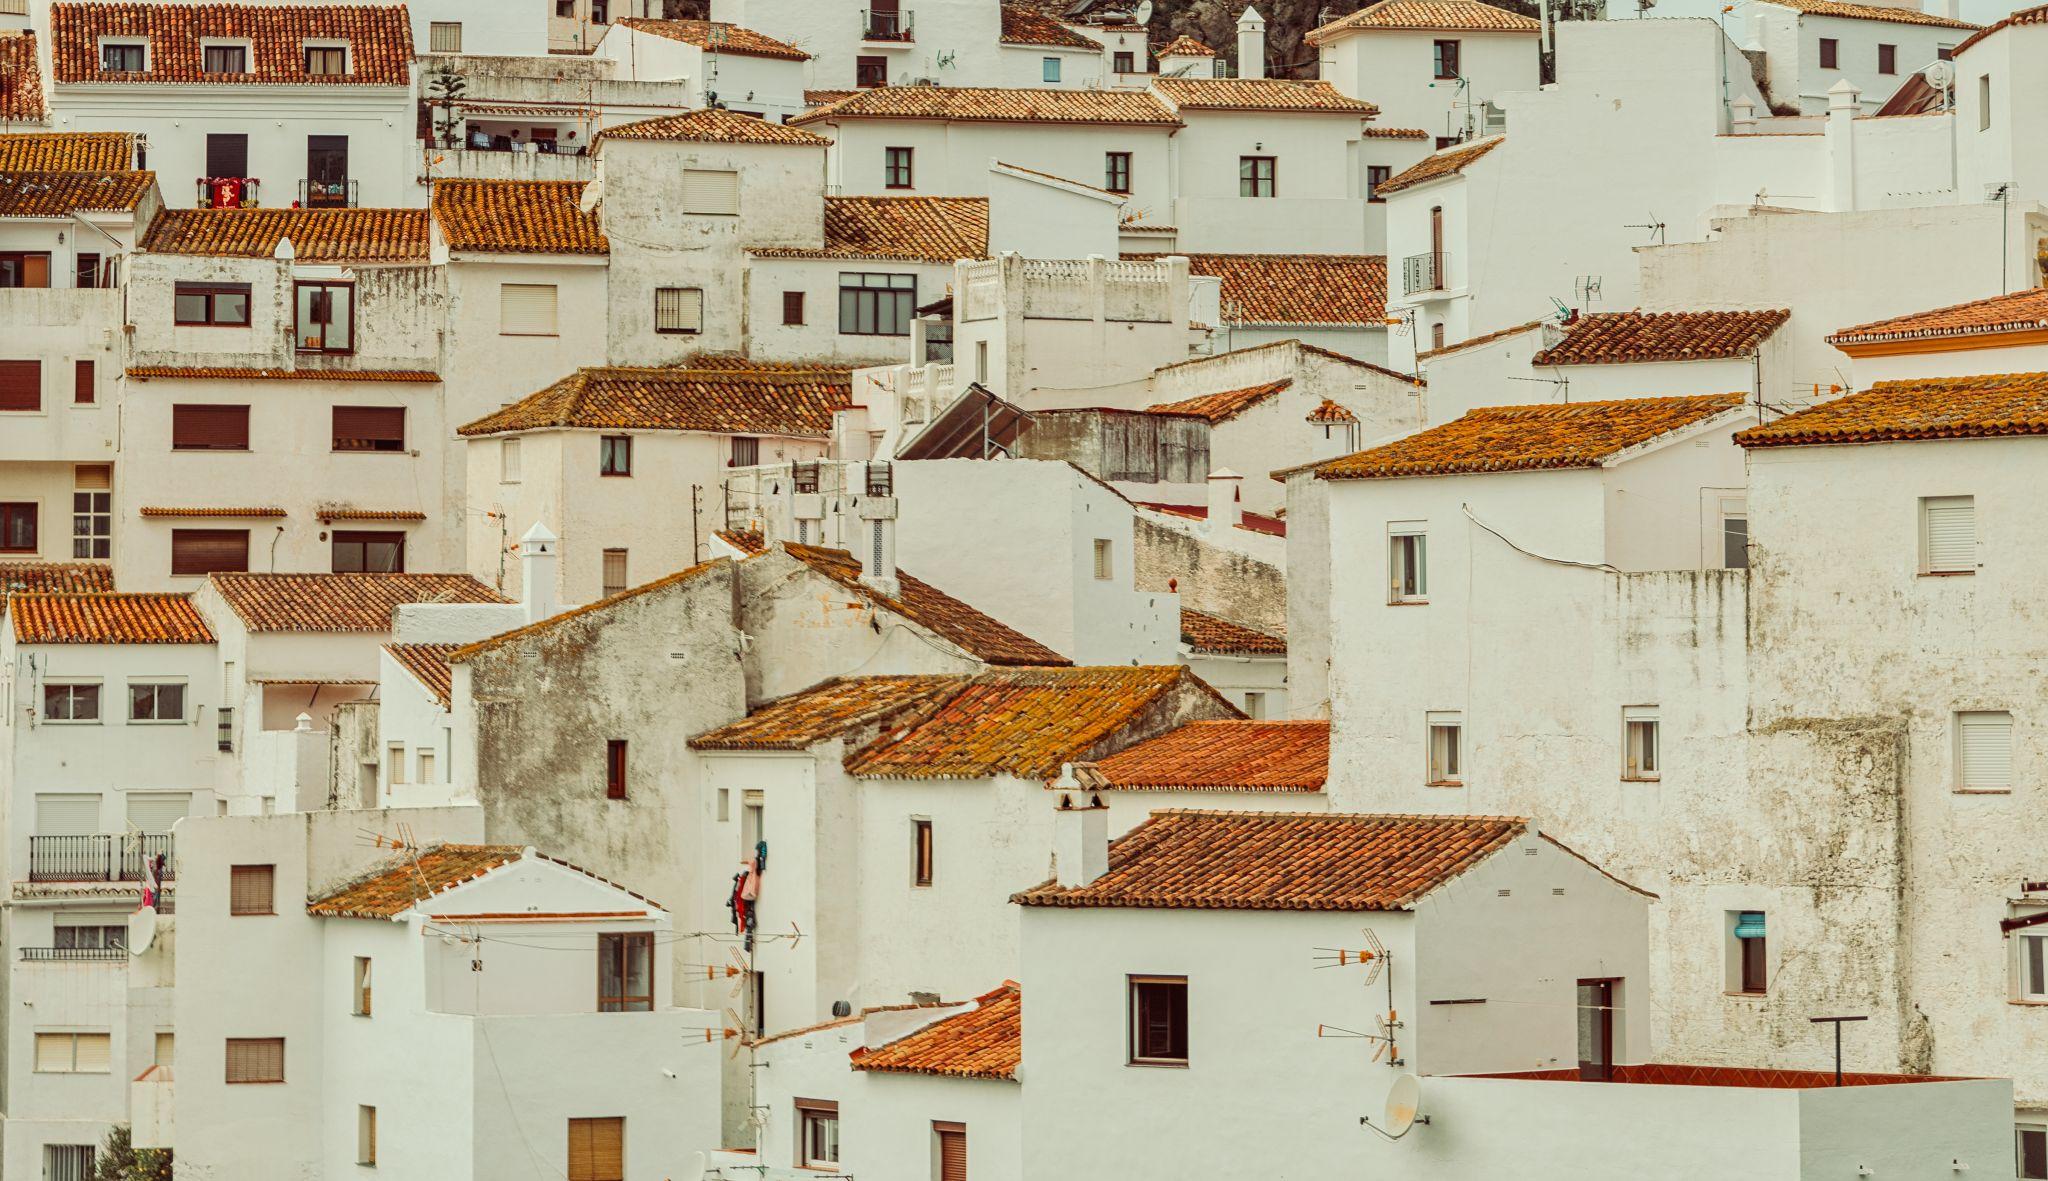 Casares village, Spain